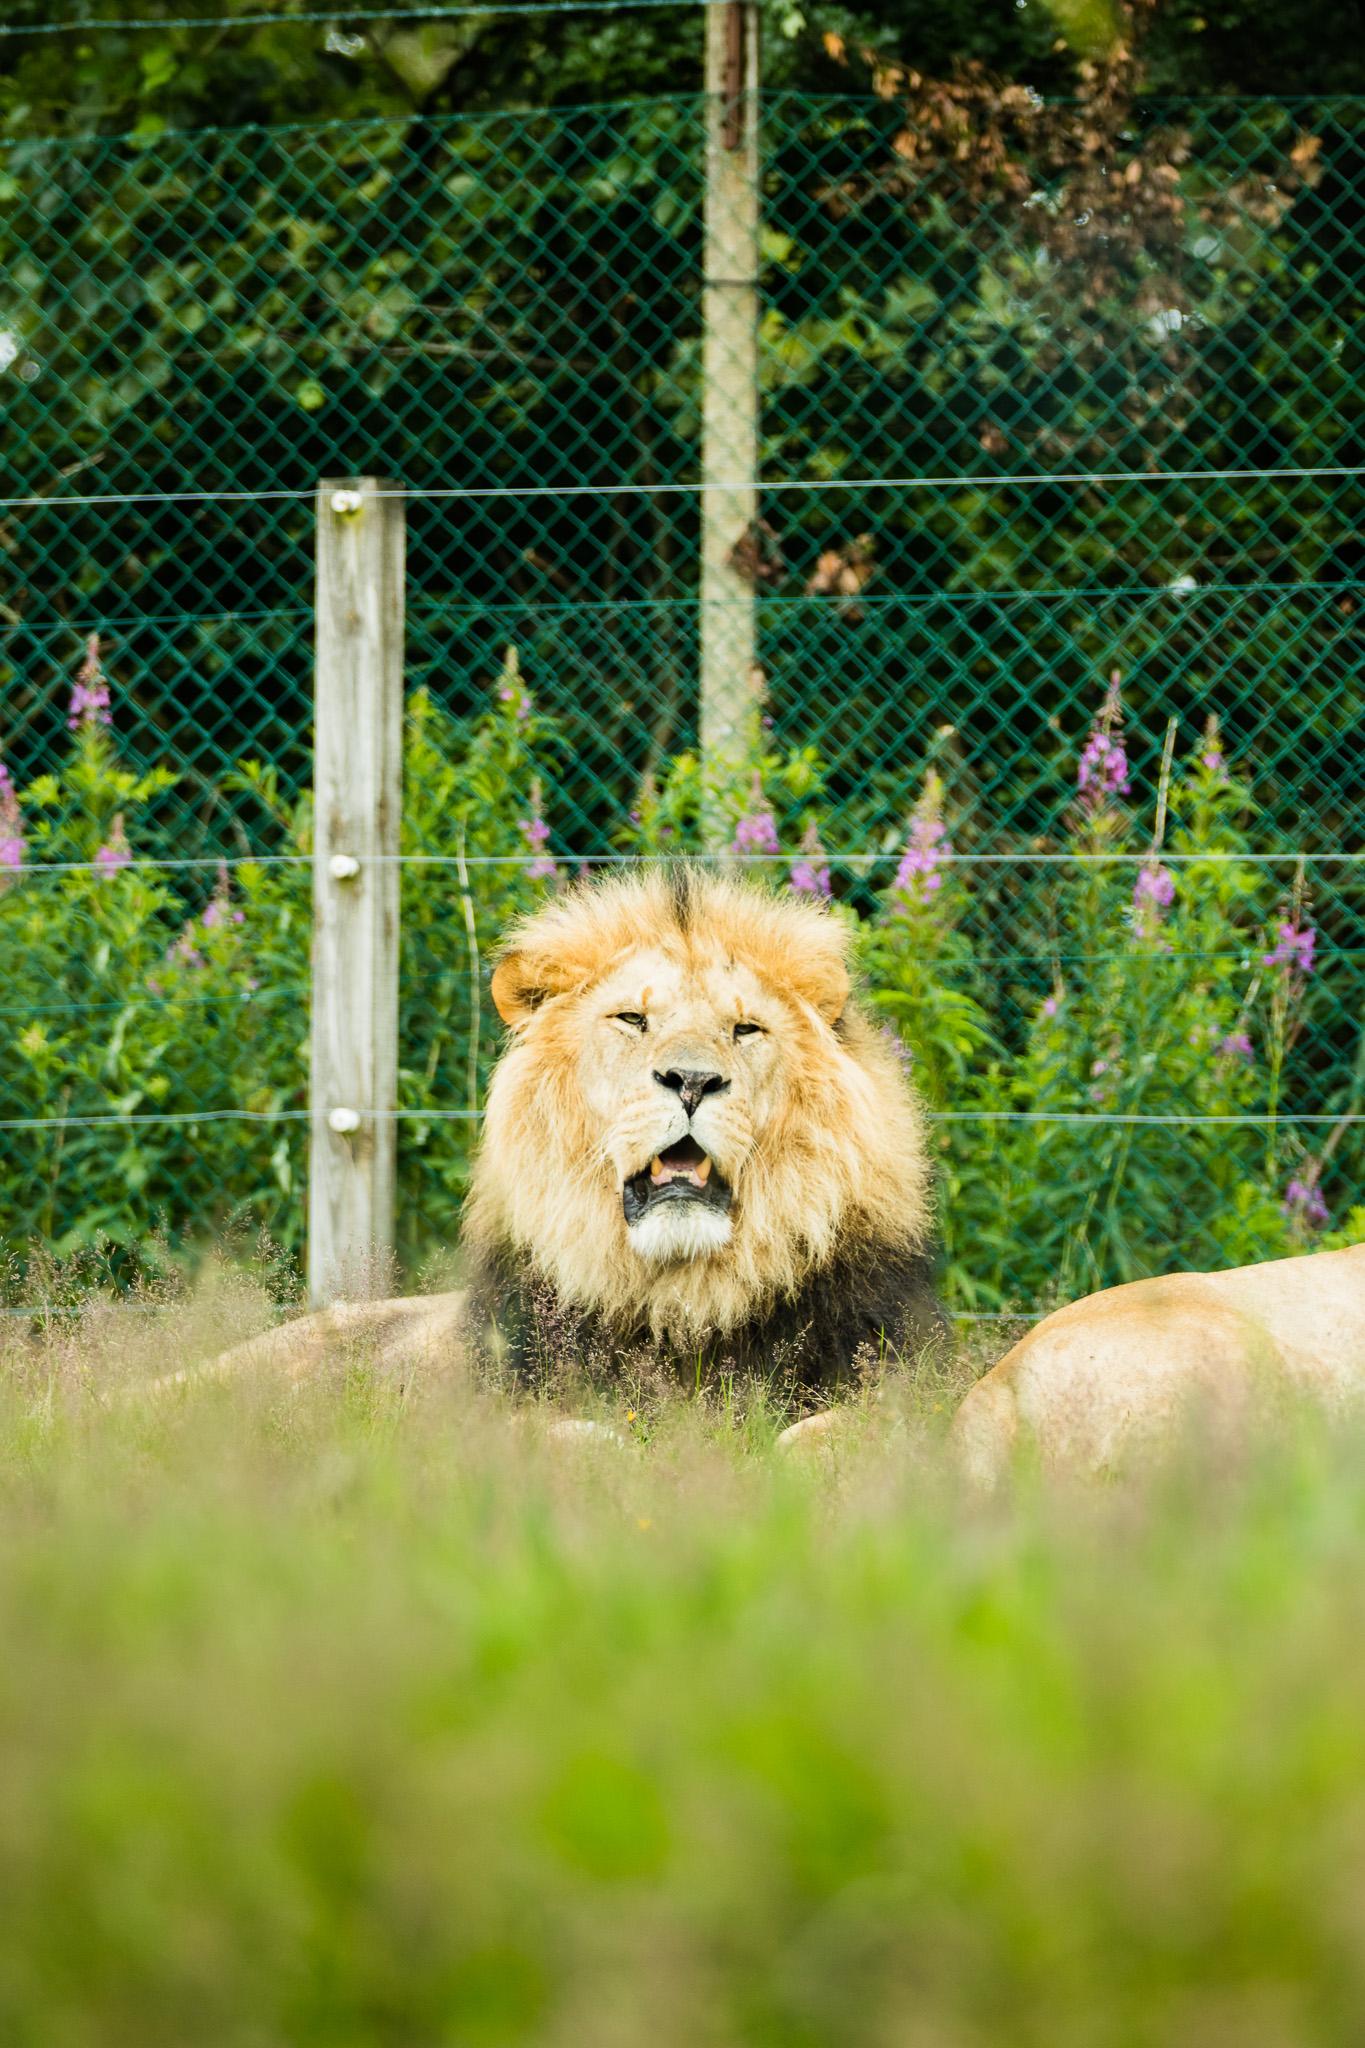 Givskud-Zoo-Safari-NorthernWorkshops-23.jpg